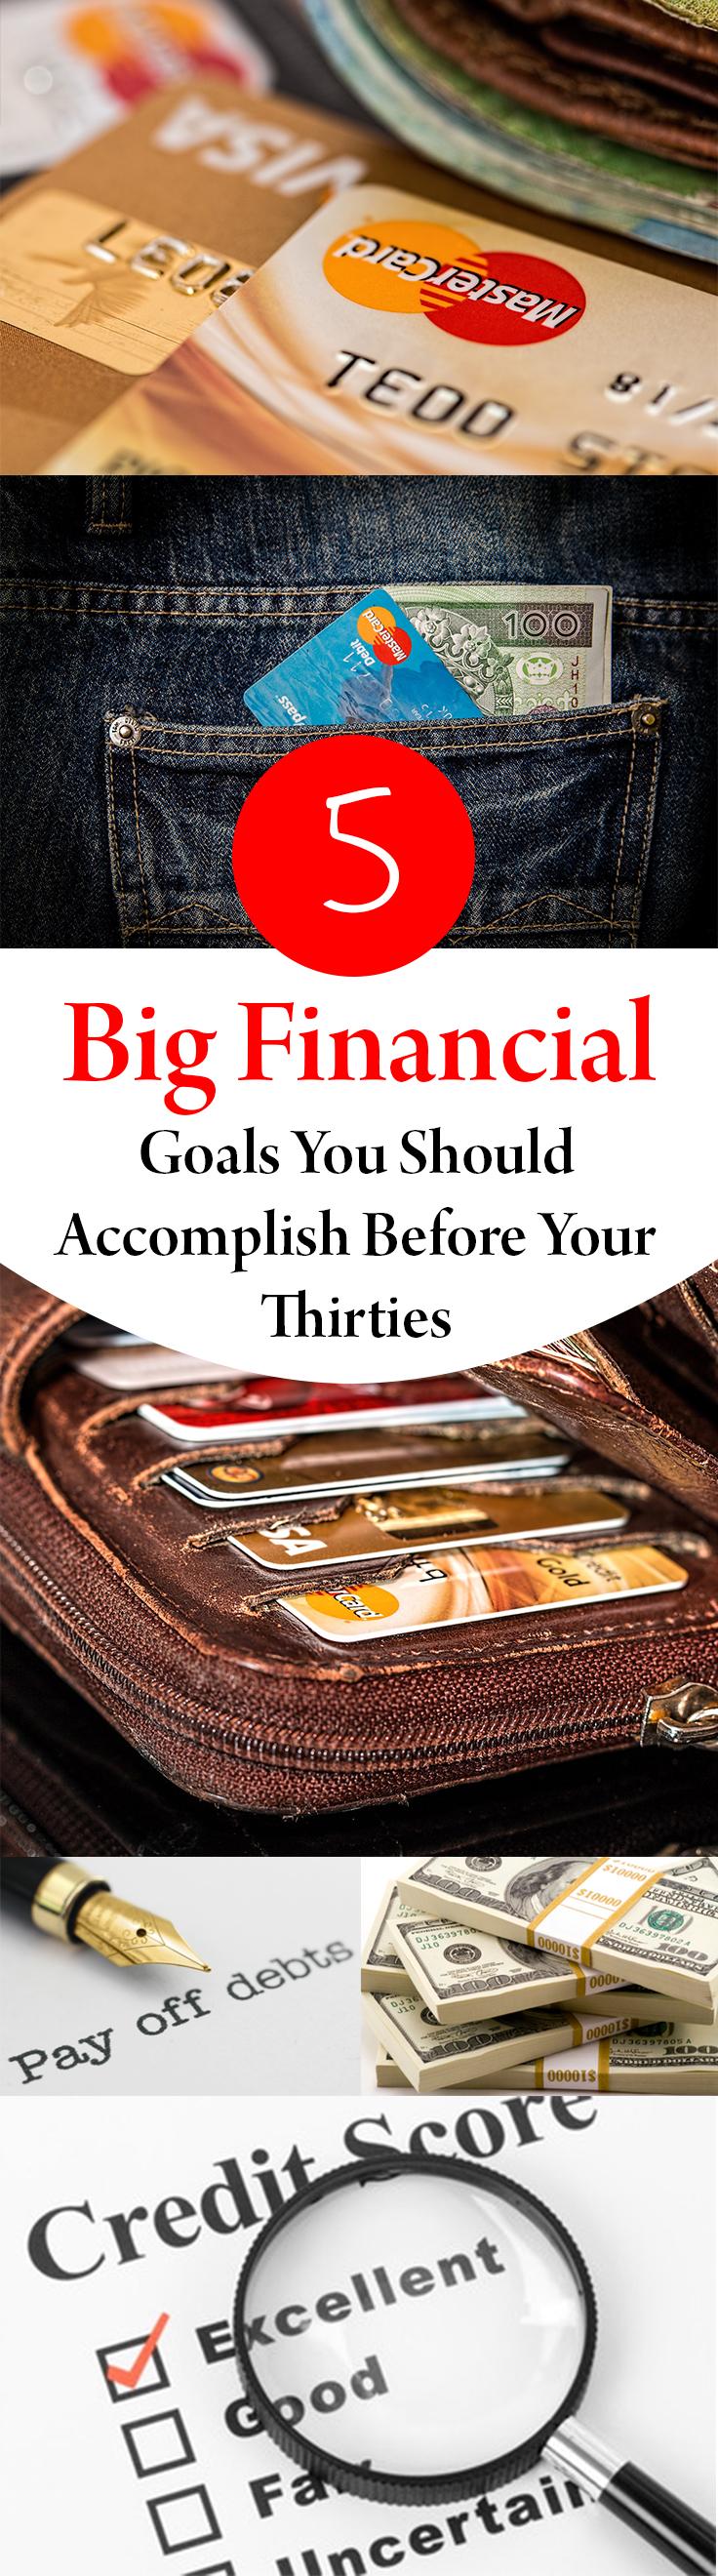 5 Big Financial Goals You Should Accomplish Before Your Thirties